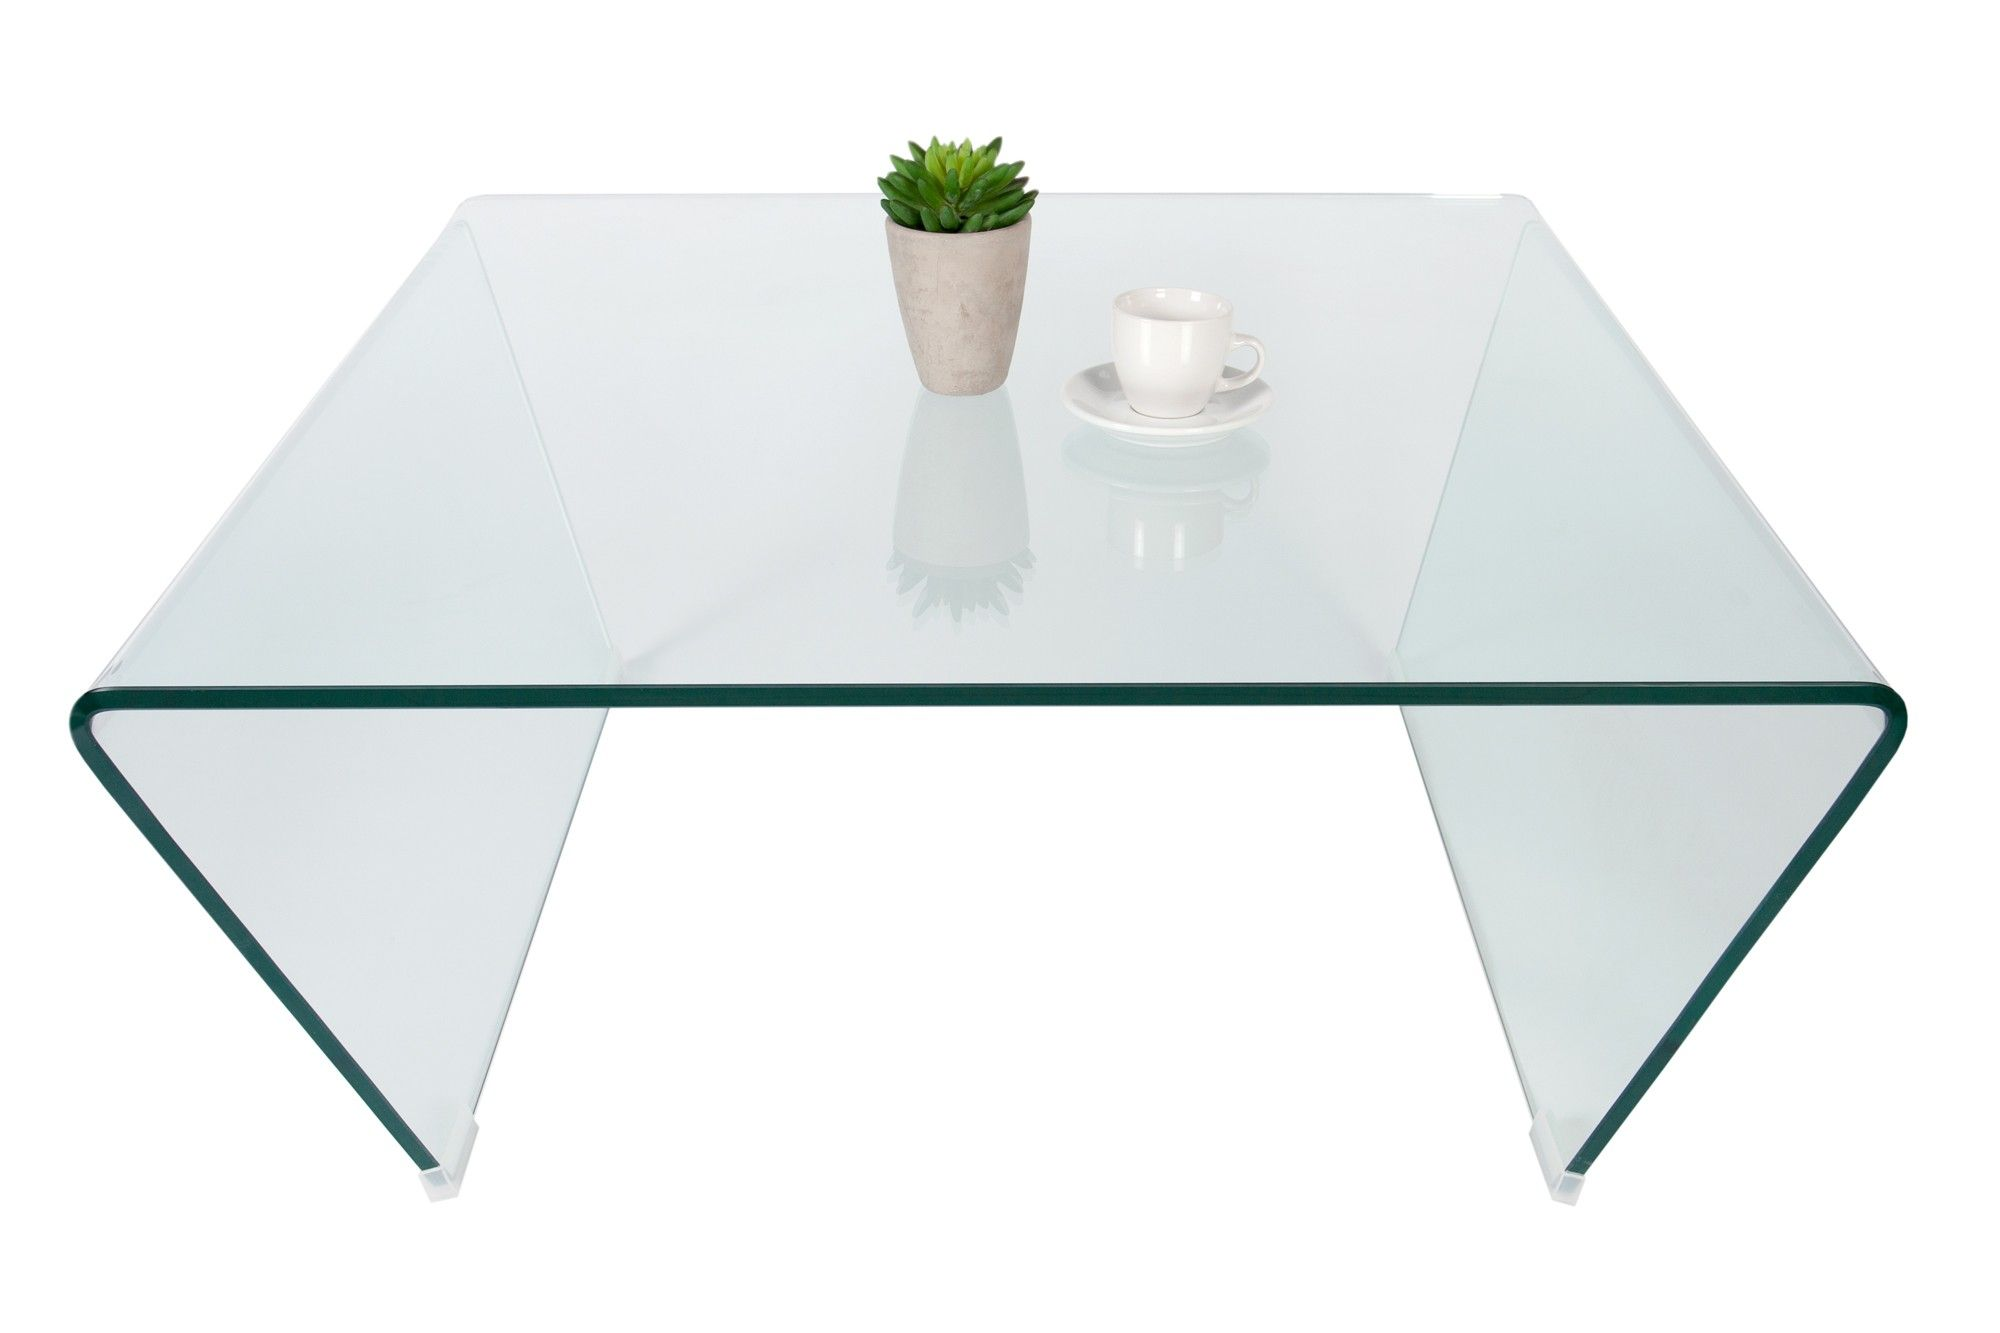 2dccba197a576970621b8506ae2e57c5 Impressionnant De Table Basse Opium Conception